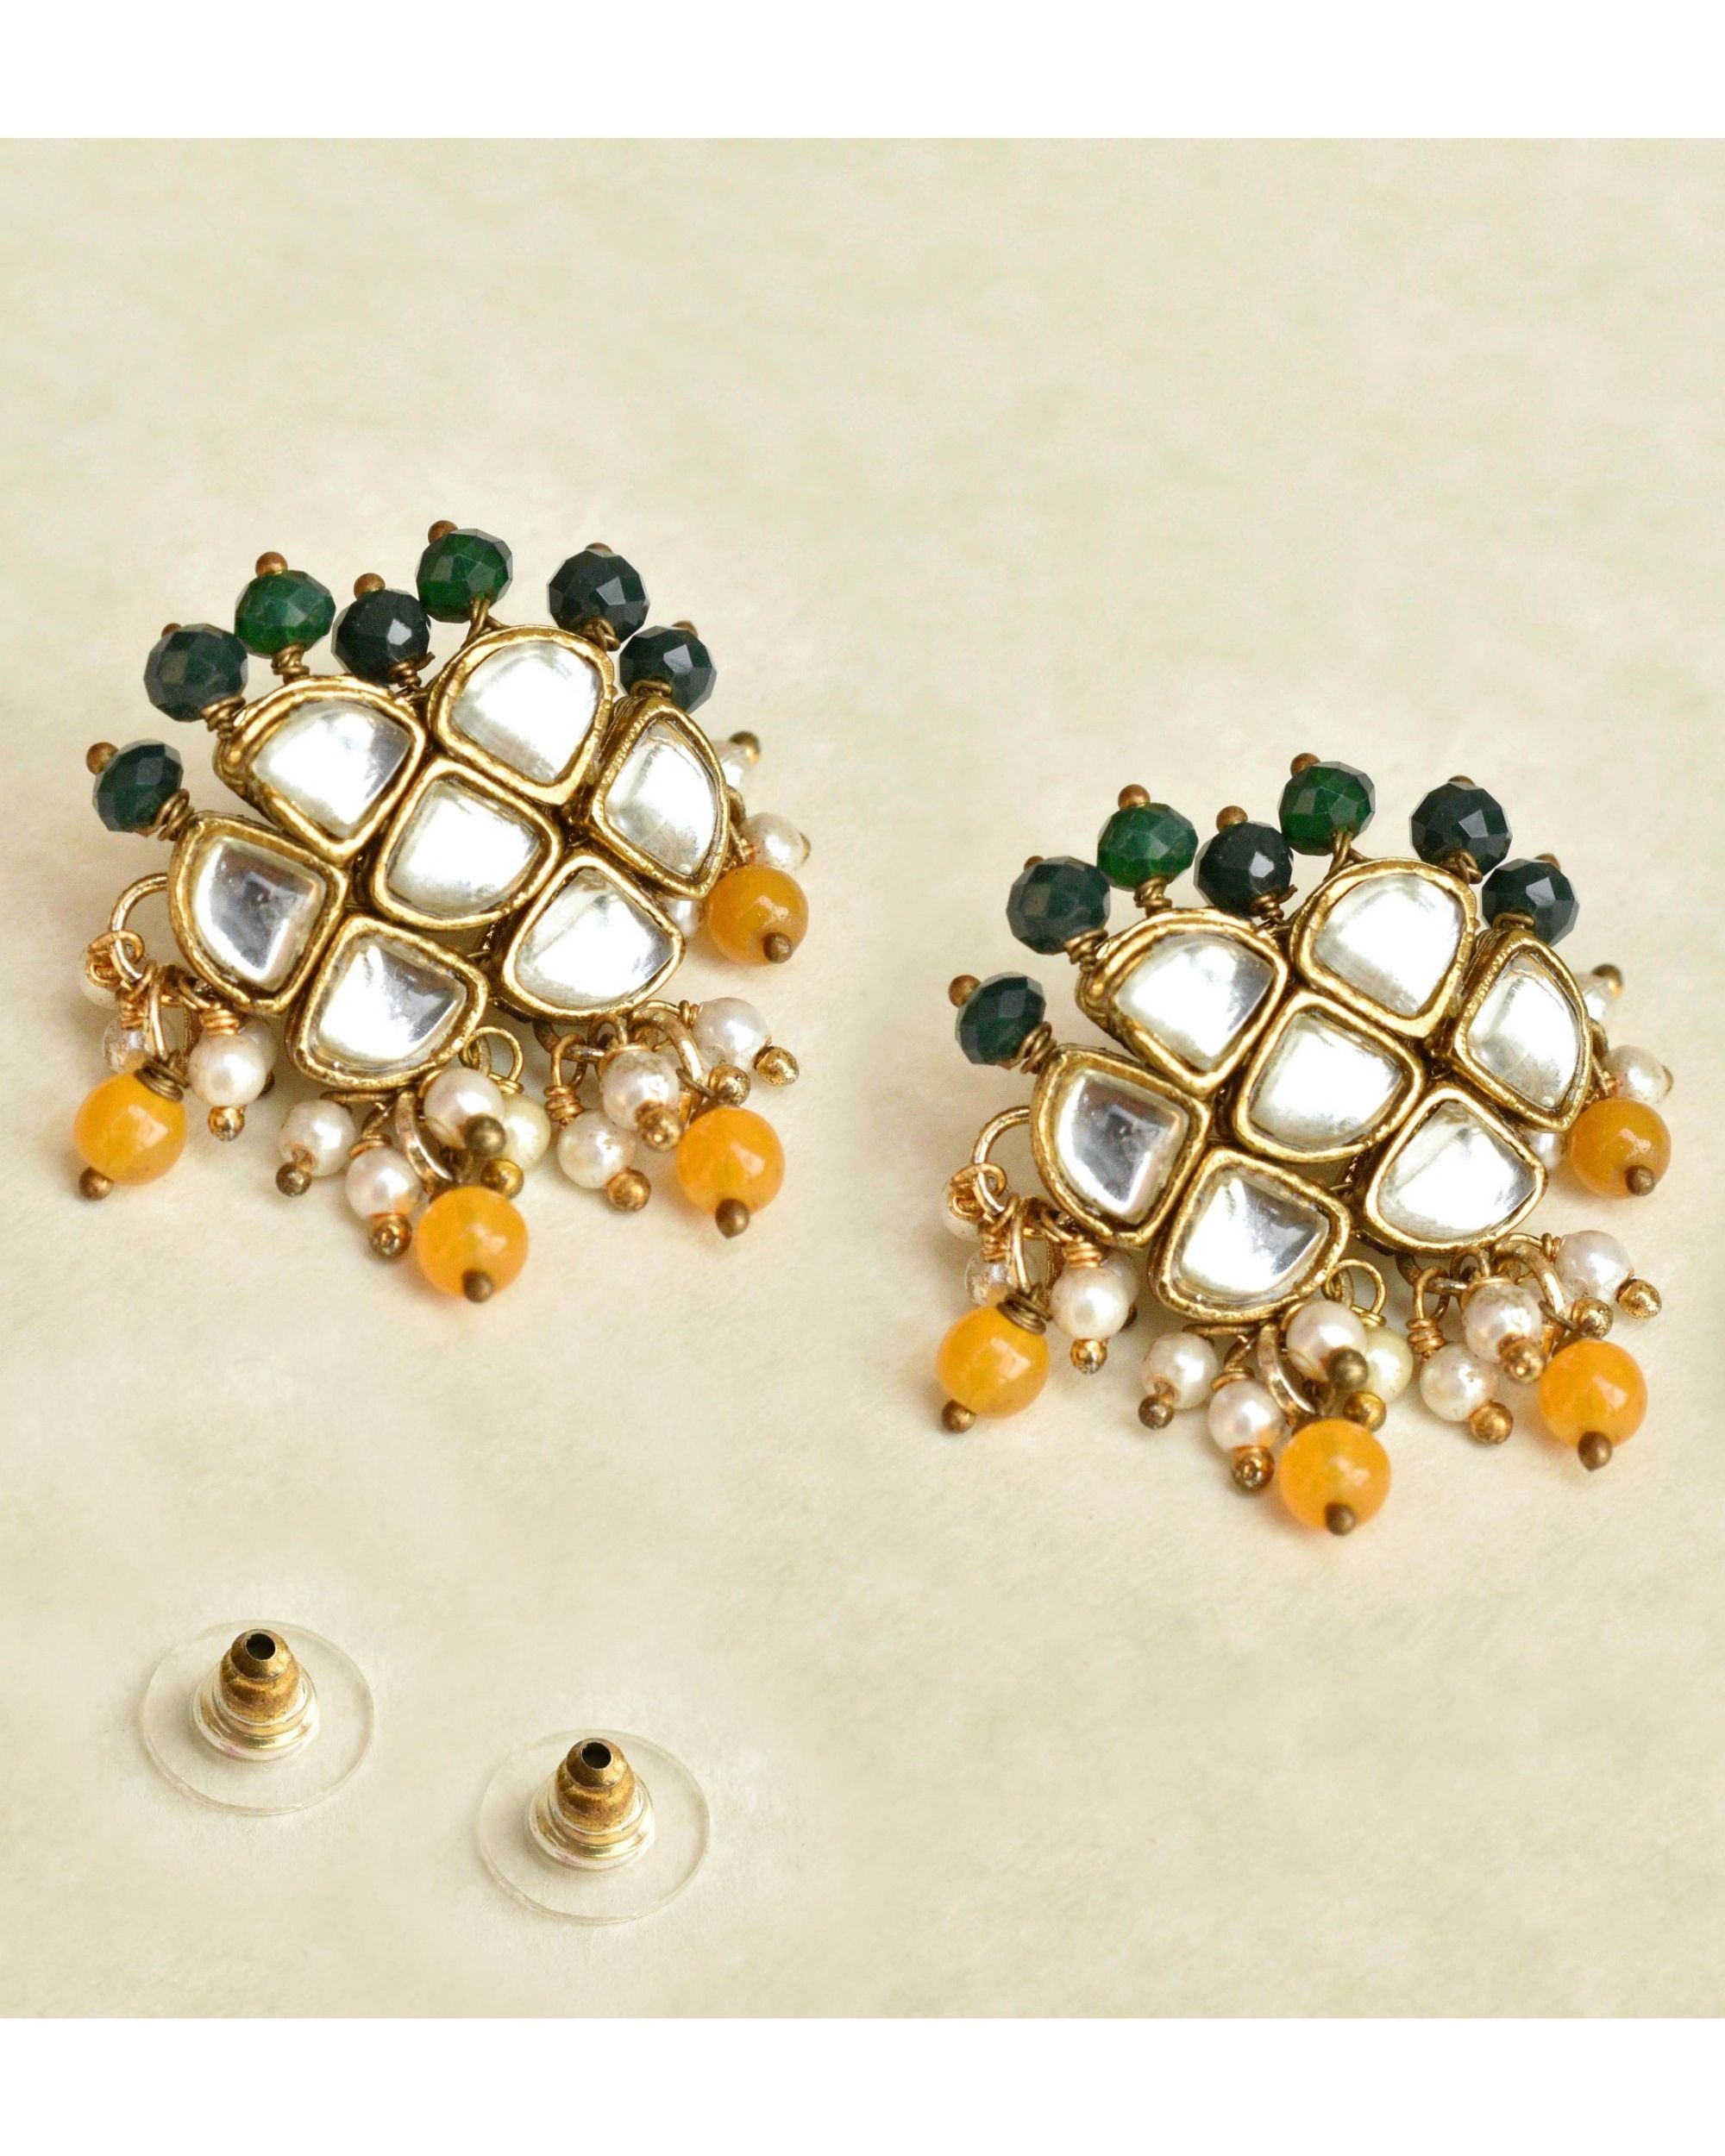 Honeycomb orange and green beaded earrings